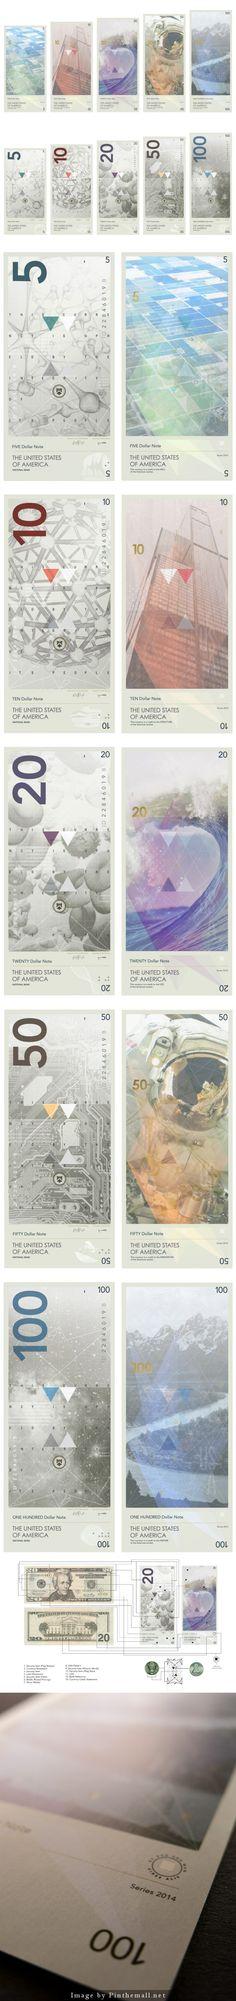 Travis Purrington reimagines US currency